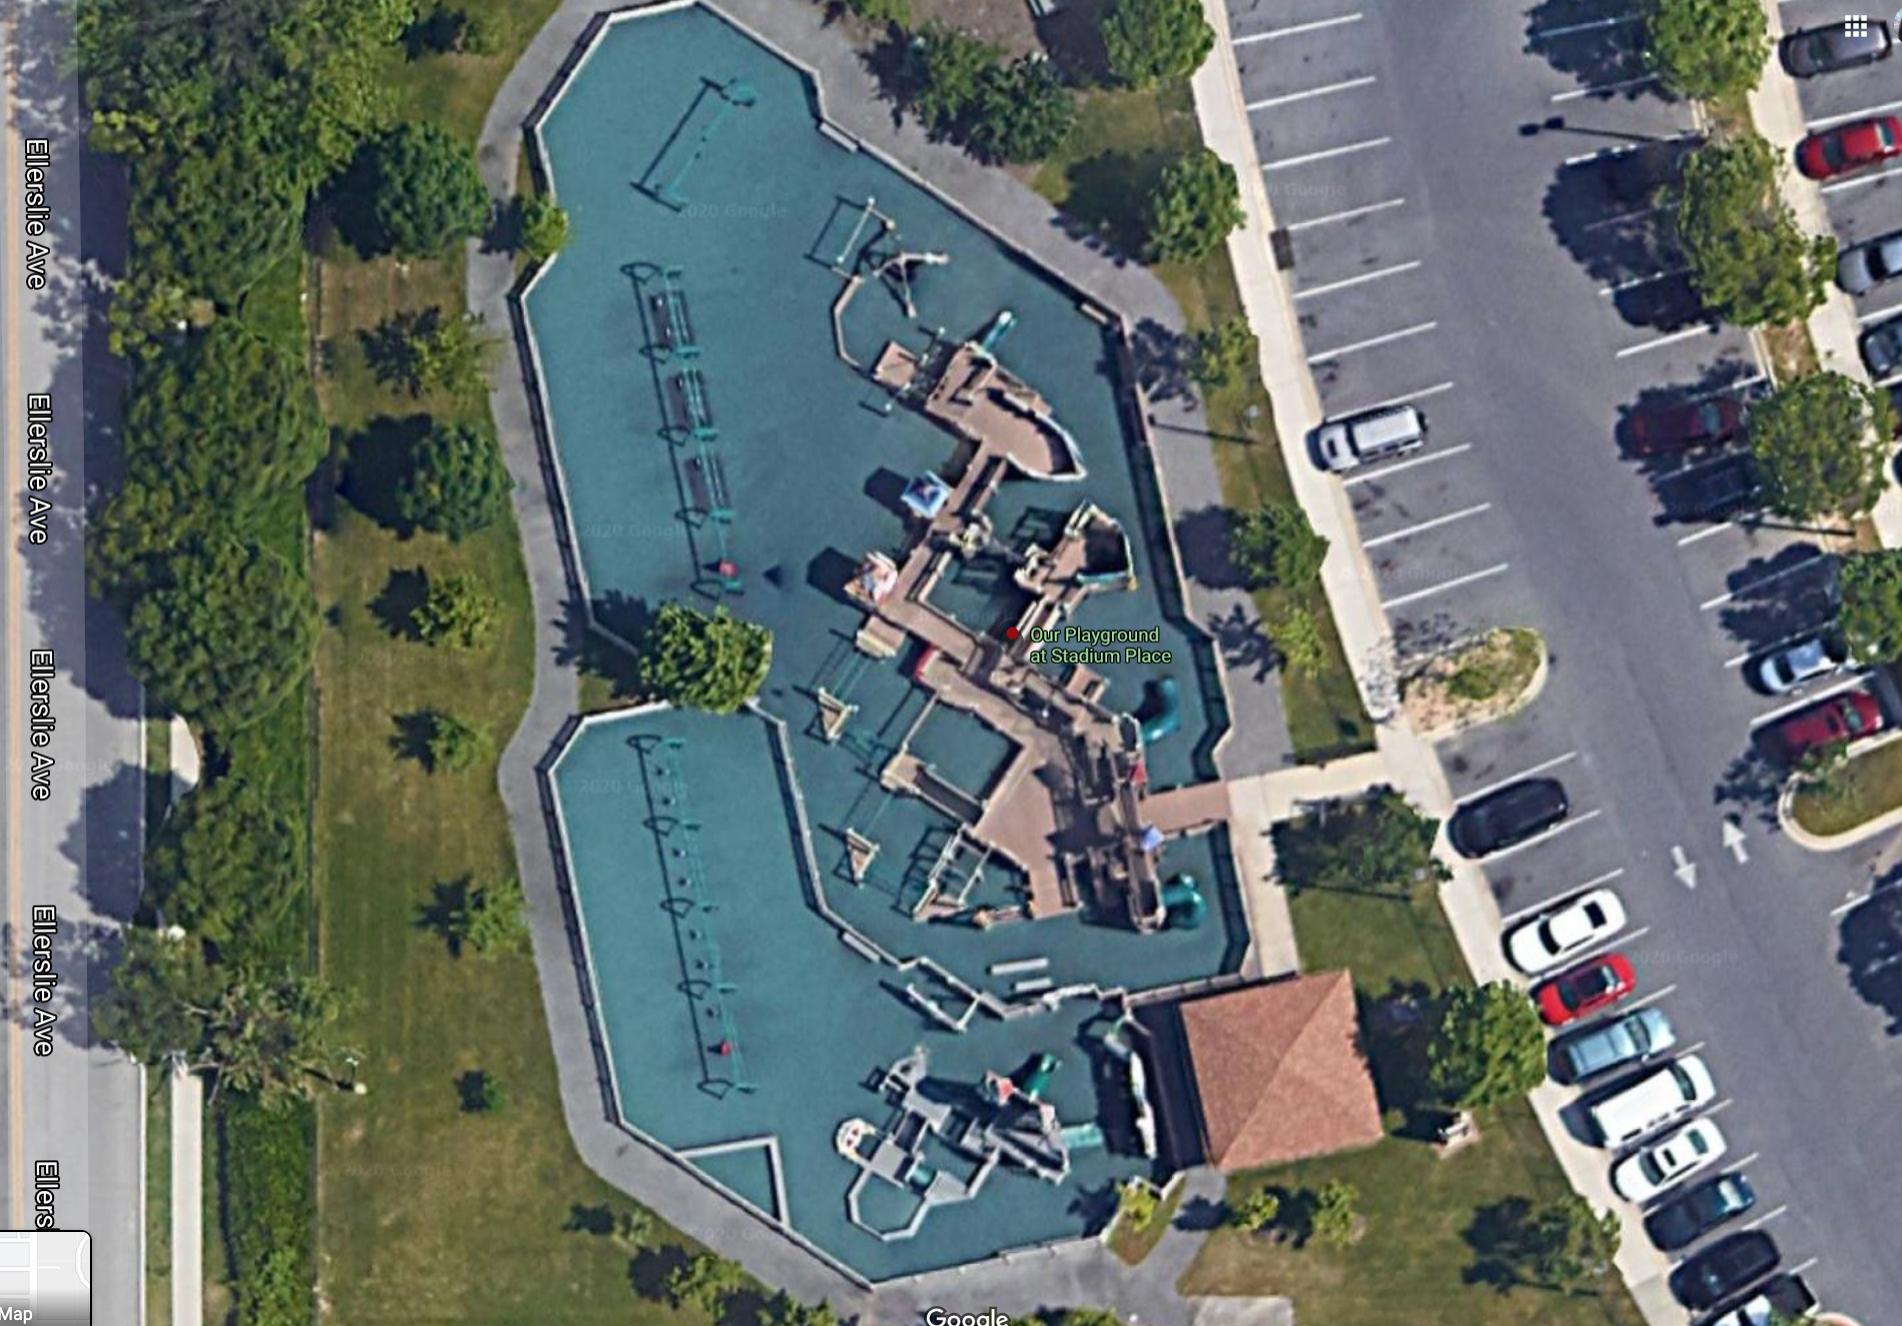 playground aerial view